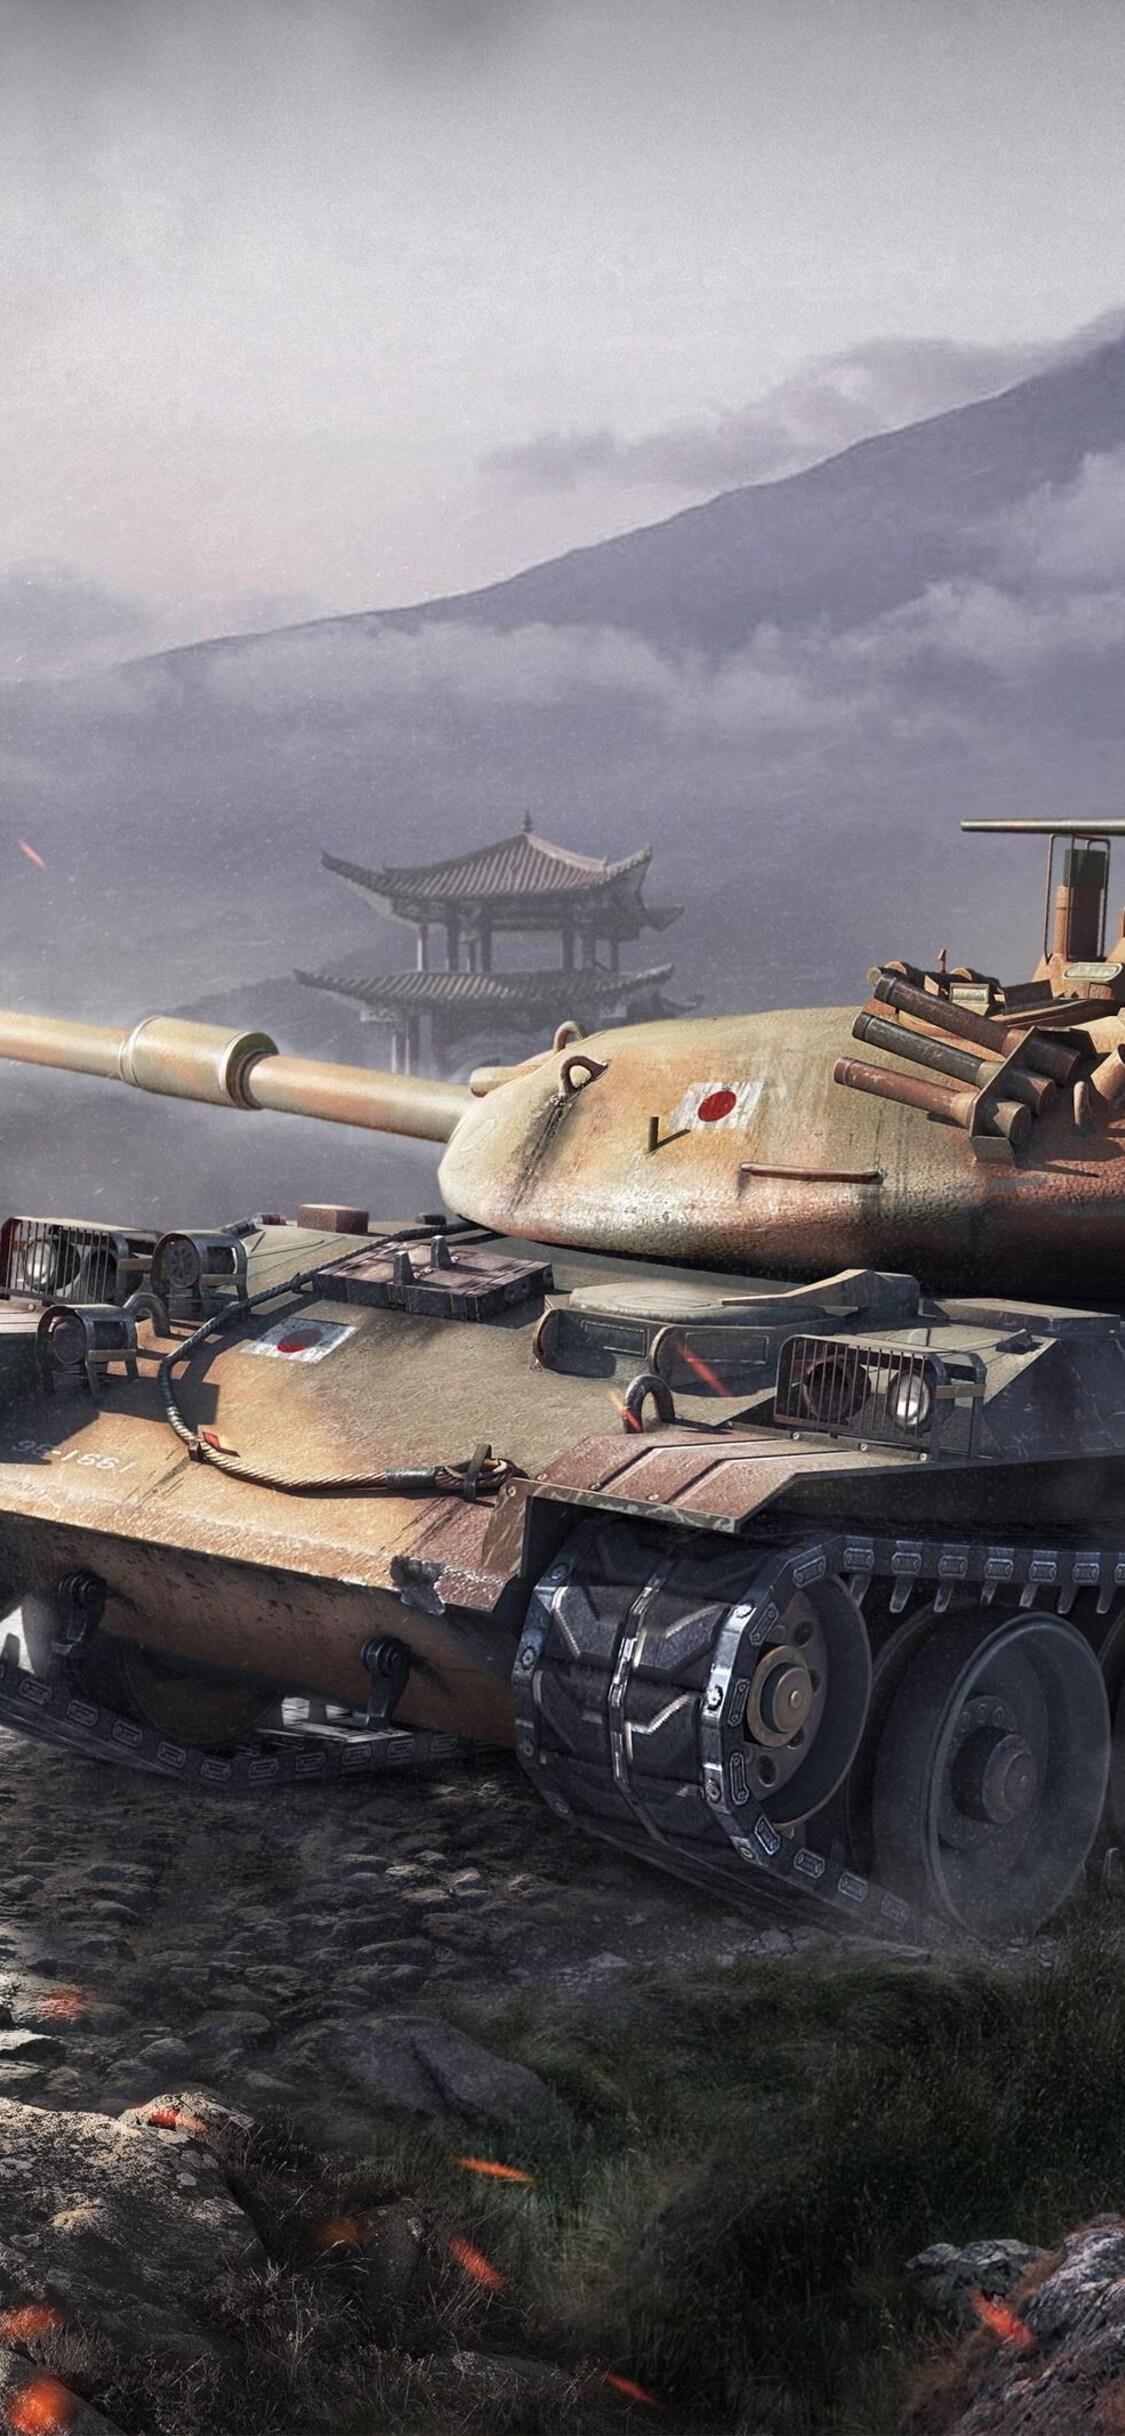 1125x2436 World Of Tanks Iphone Xs Iphone 10 Iphone X Hd 4k